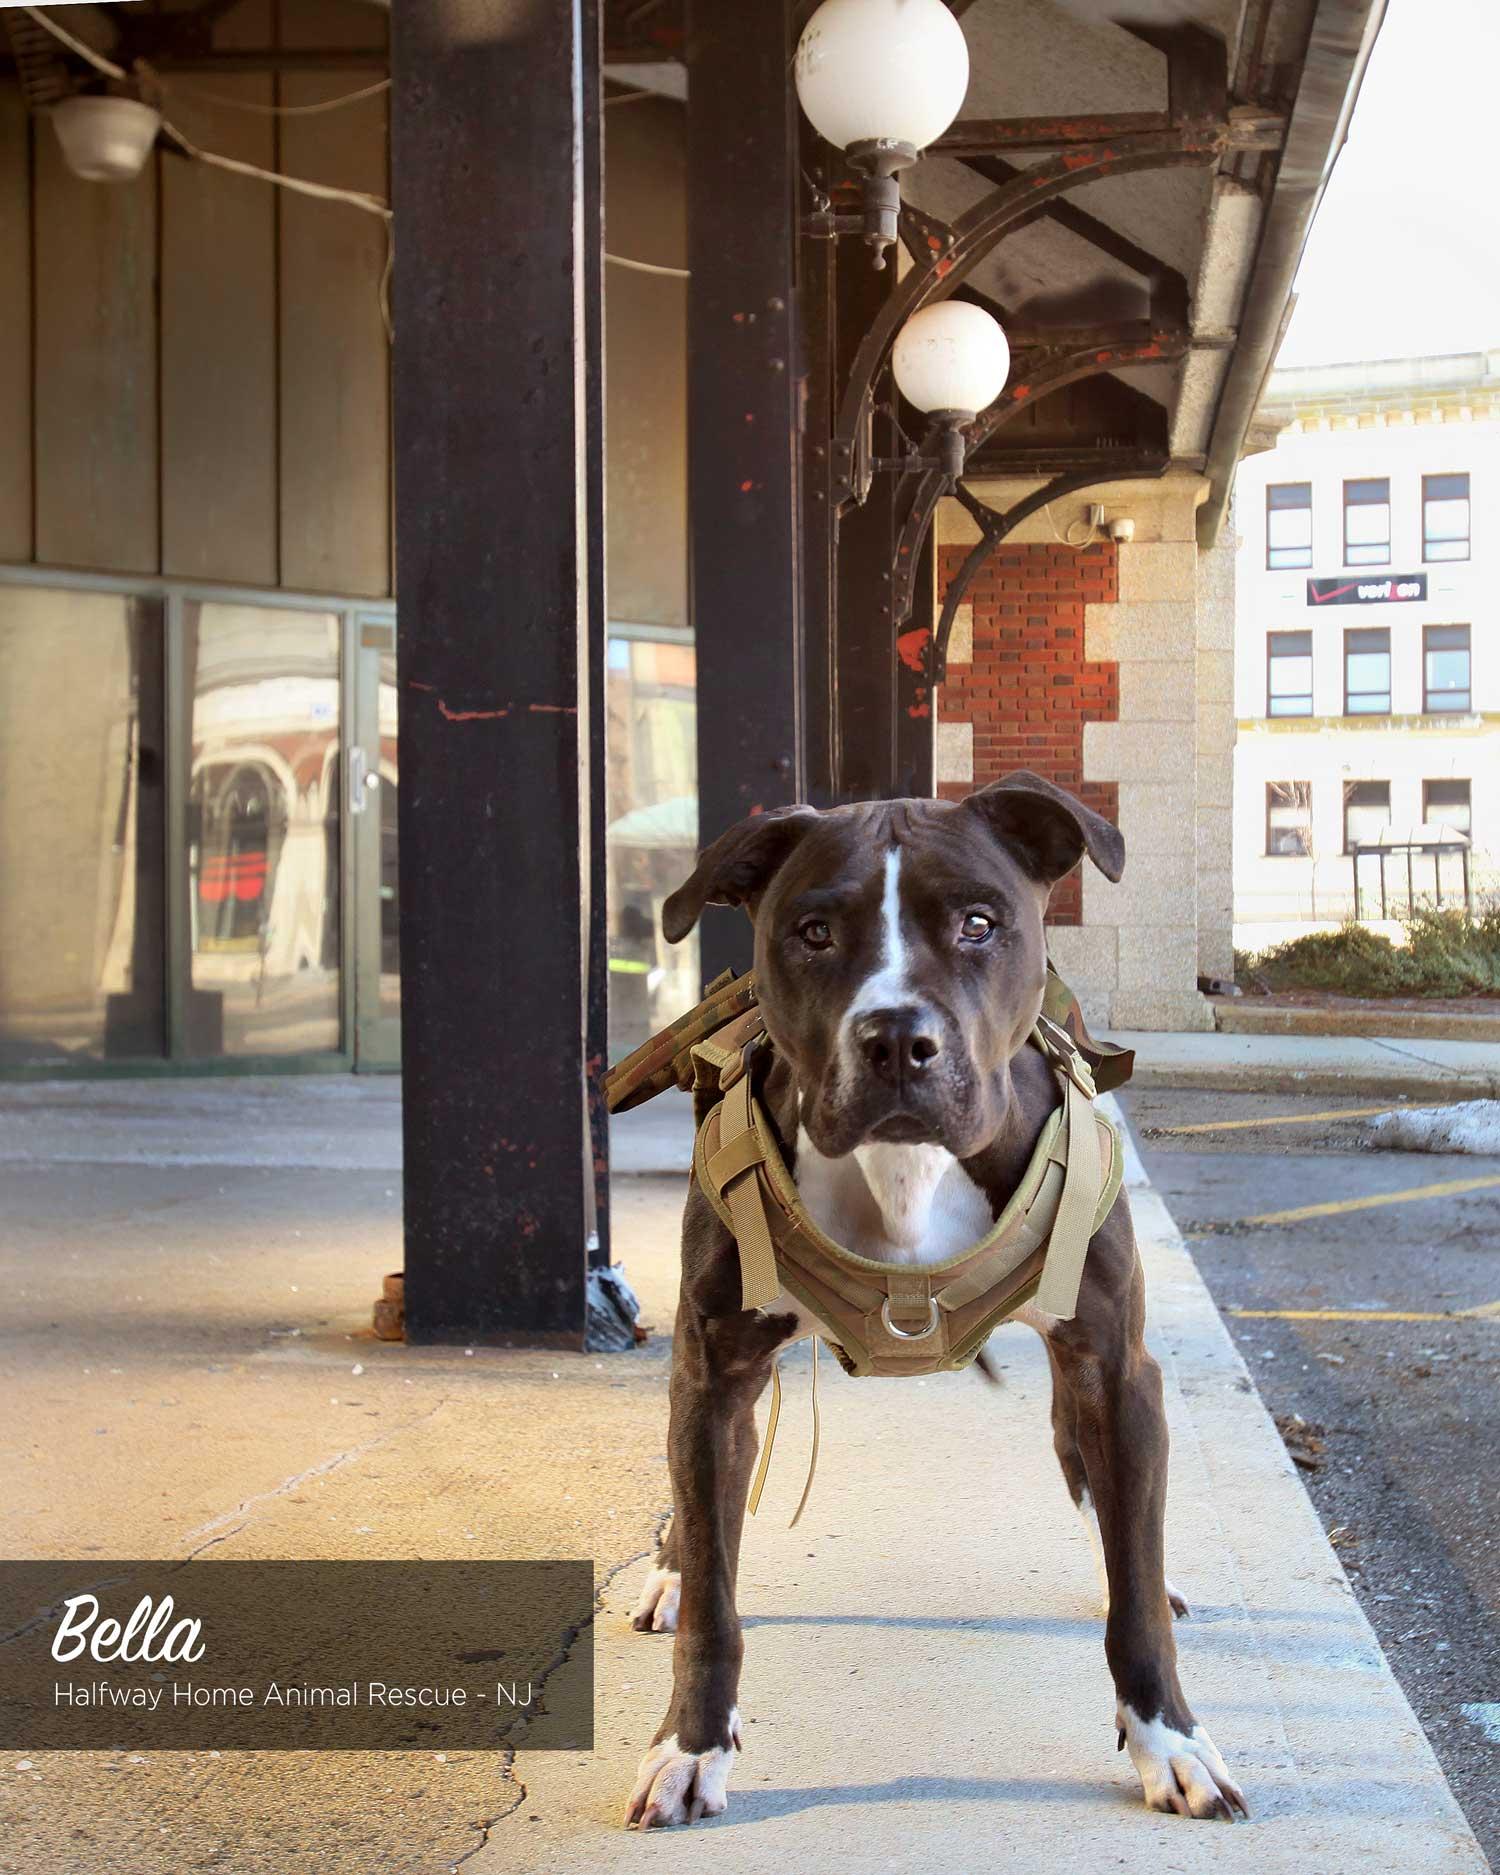 bella adoptable dog in nj